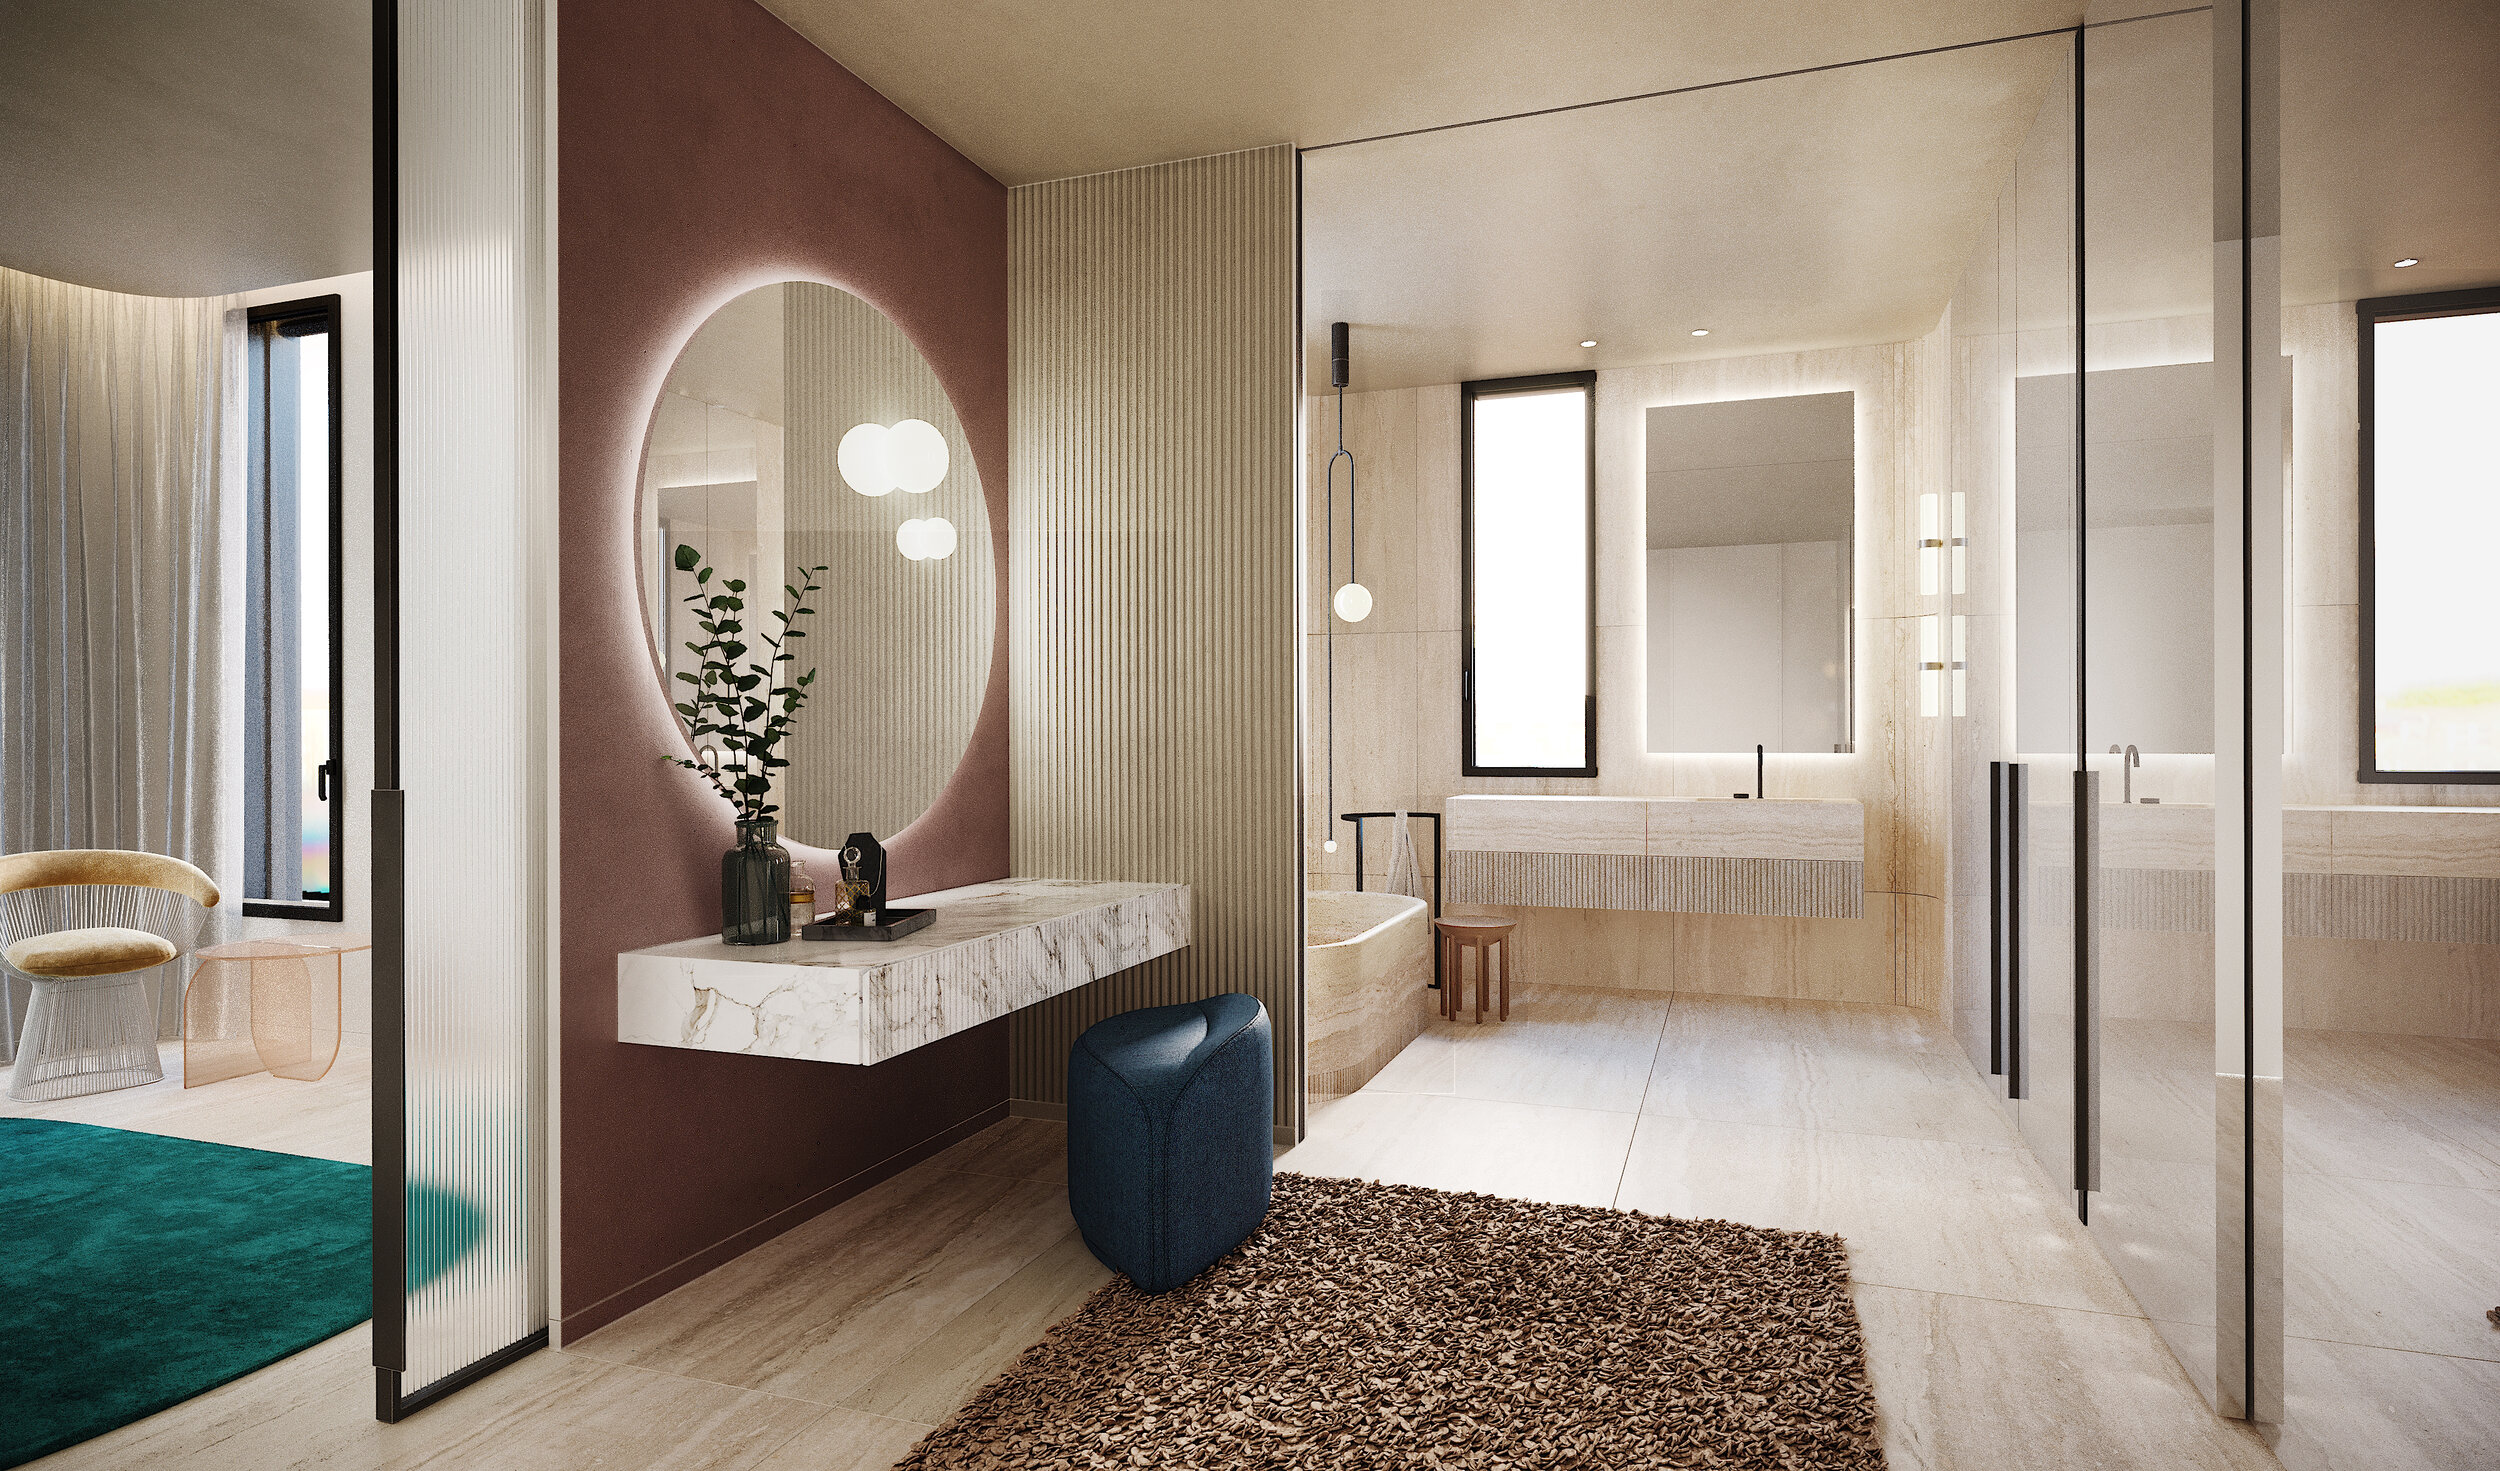 Previa 03 masterbathroom - imagen 22.jpg